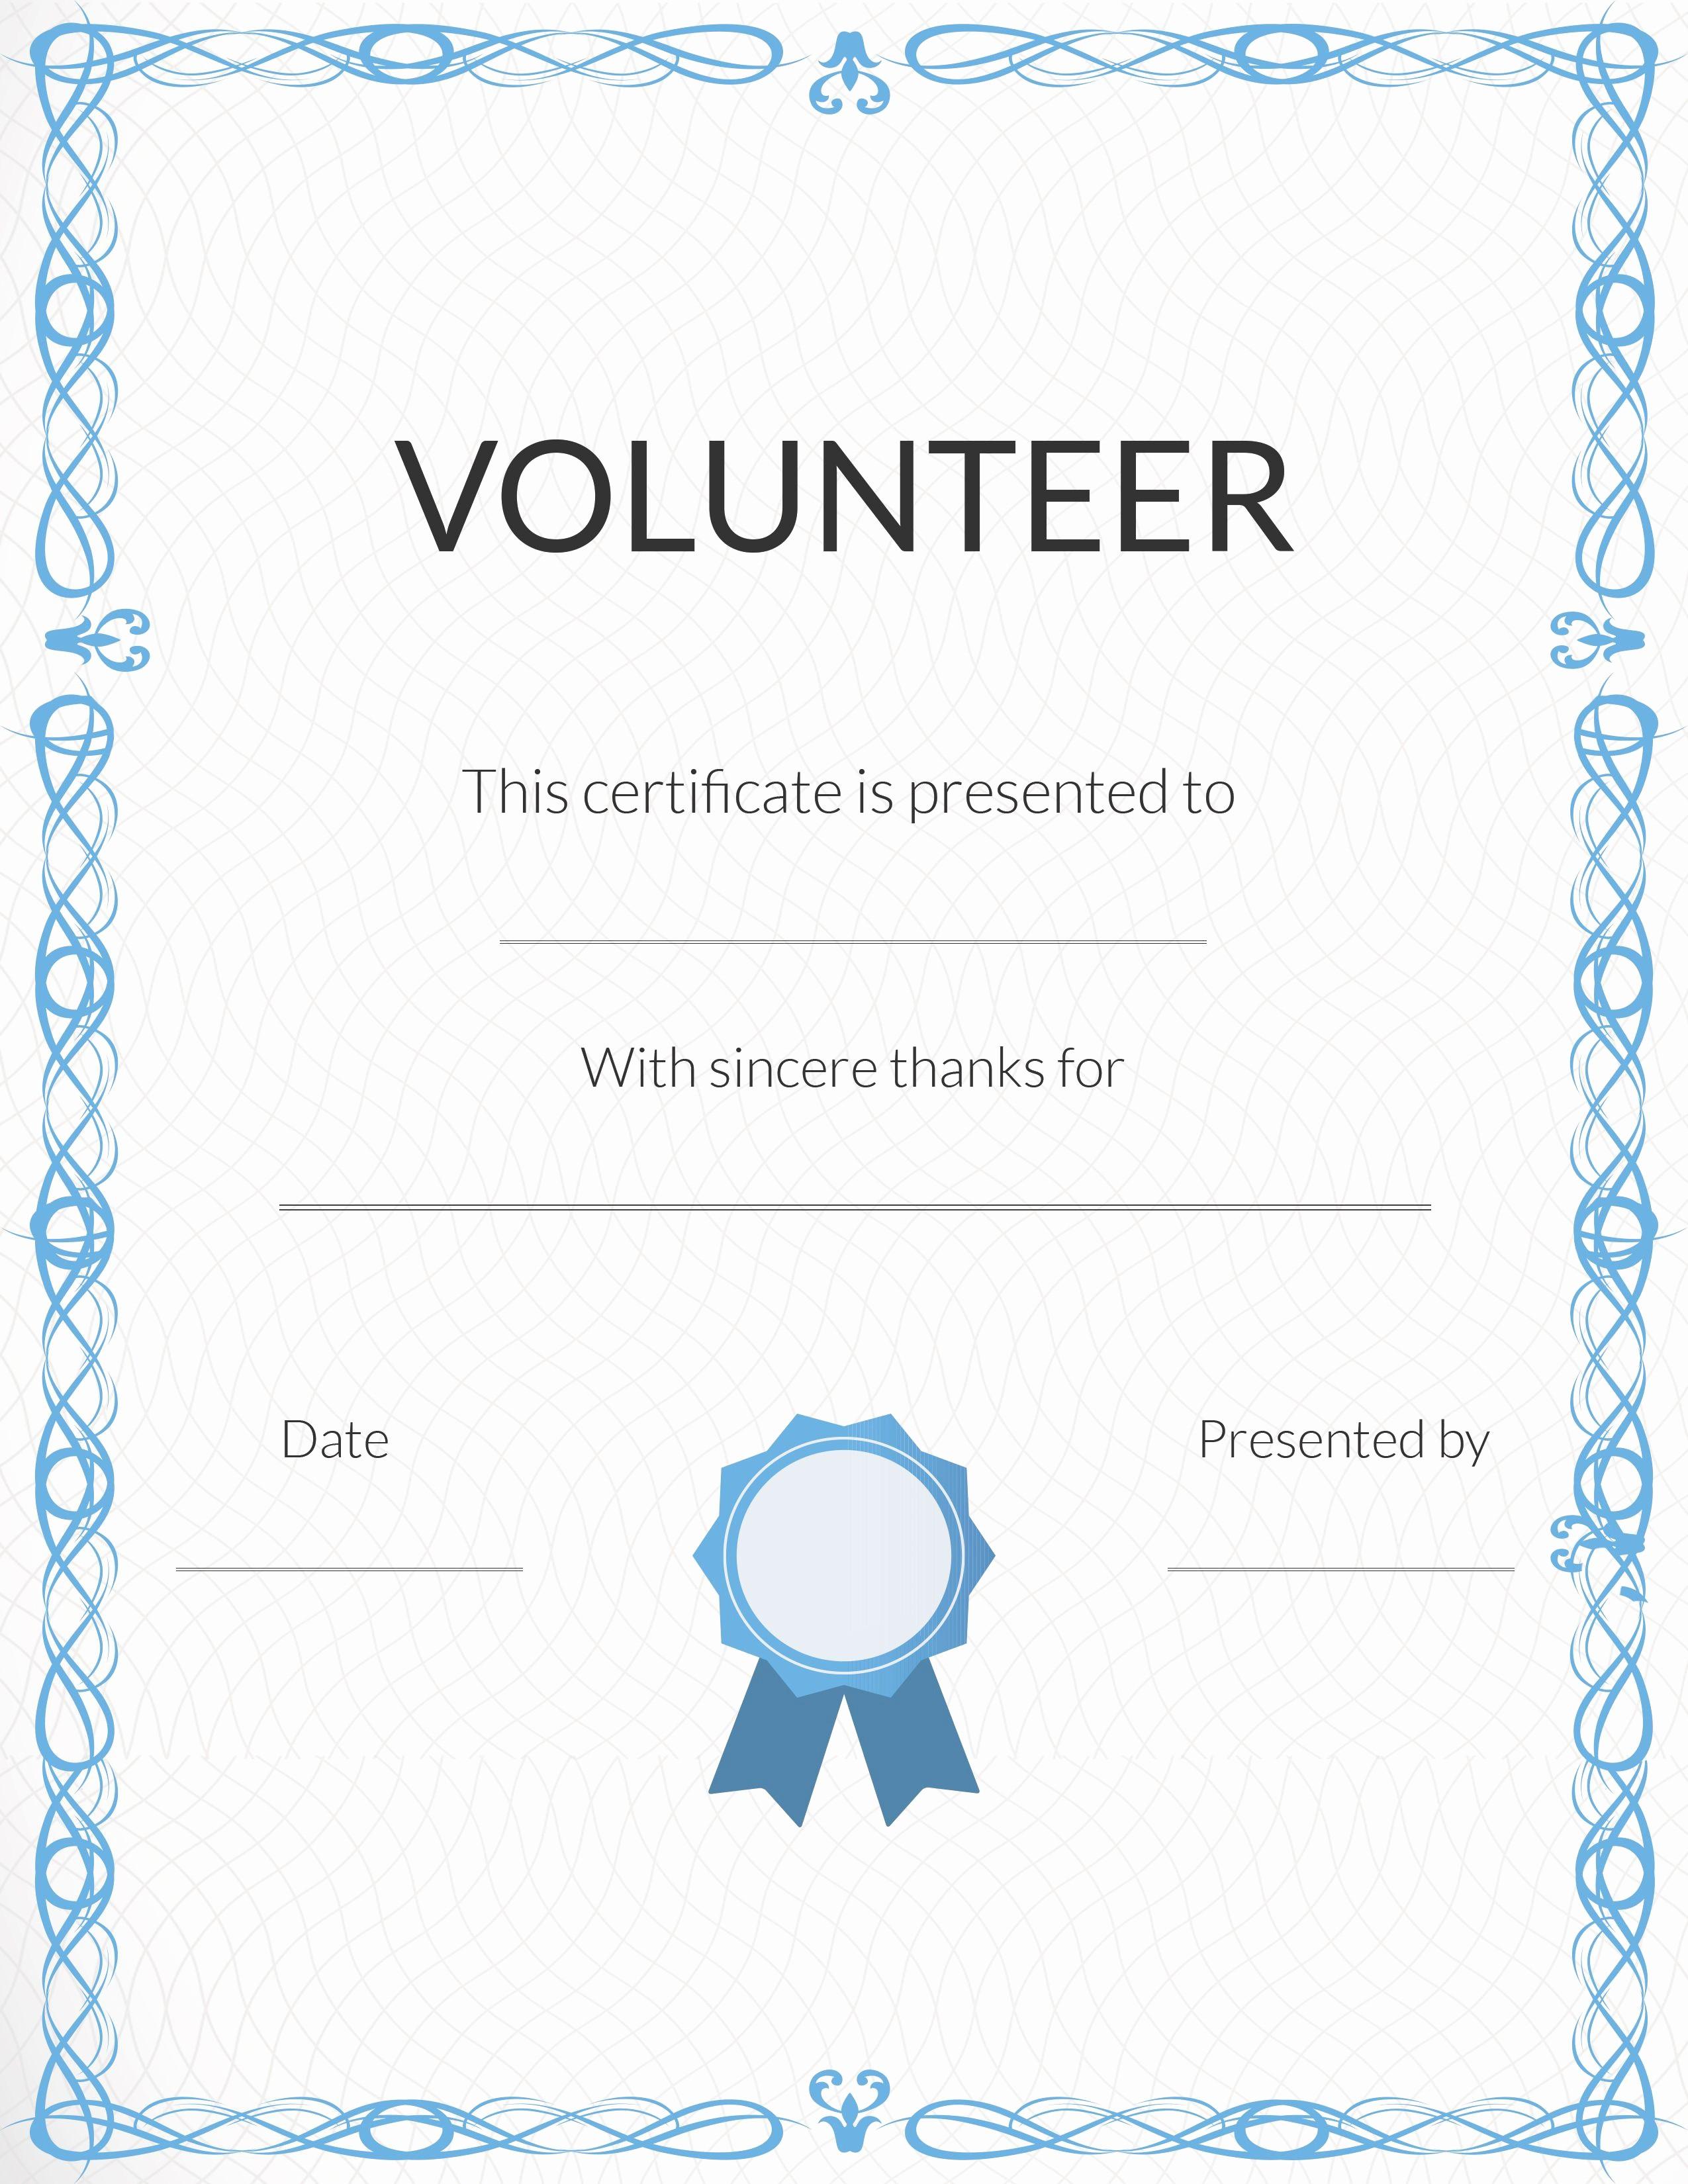 Printable Certificate Of Appreciation Template New Free Volunteer Appreciation Certificates — Signup